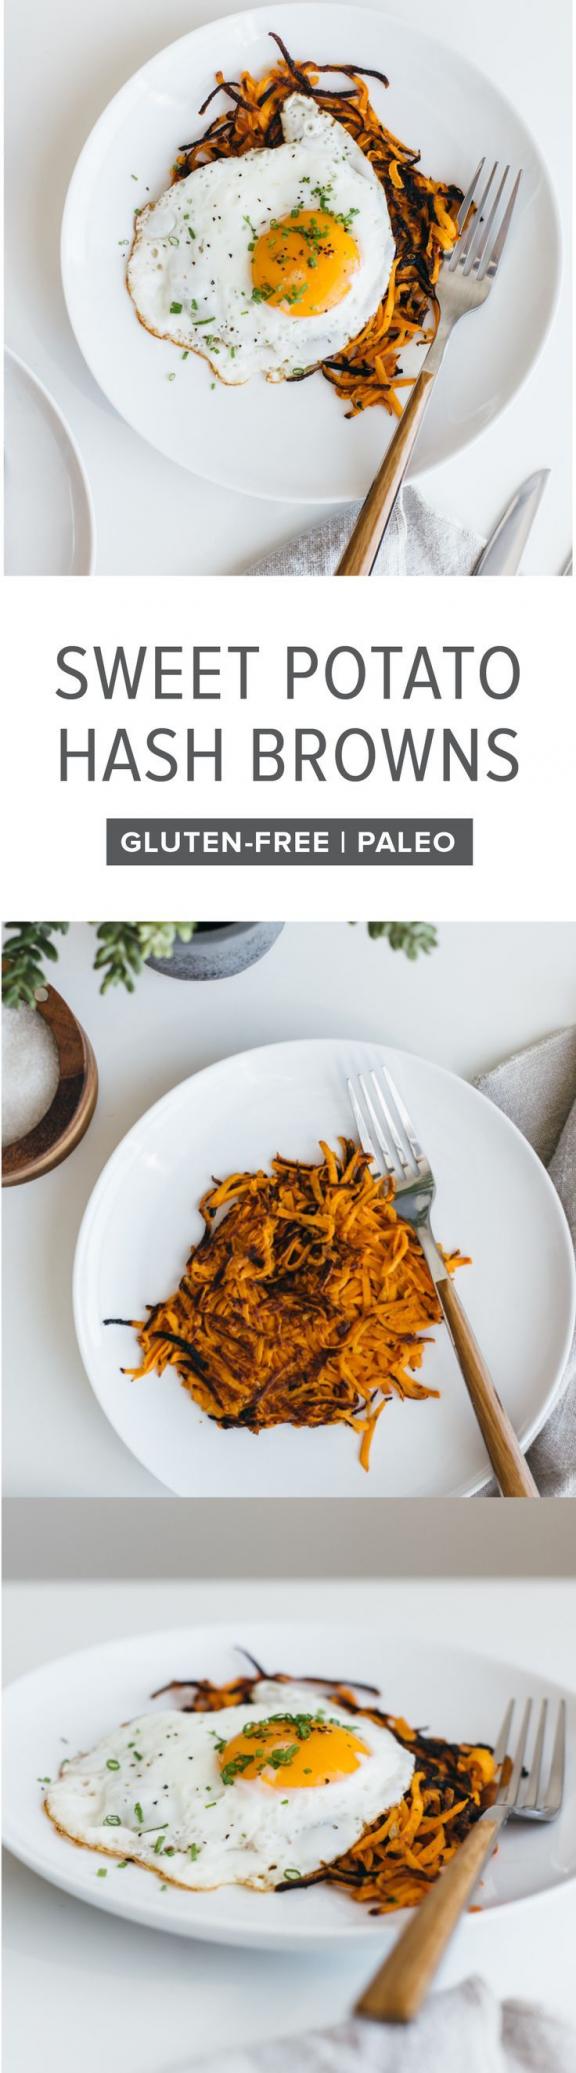 (glutenfree vegan paleo) These sweet potato hash browns